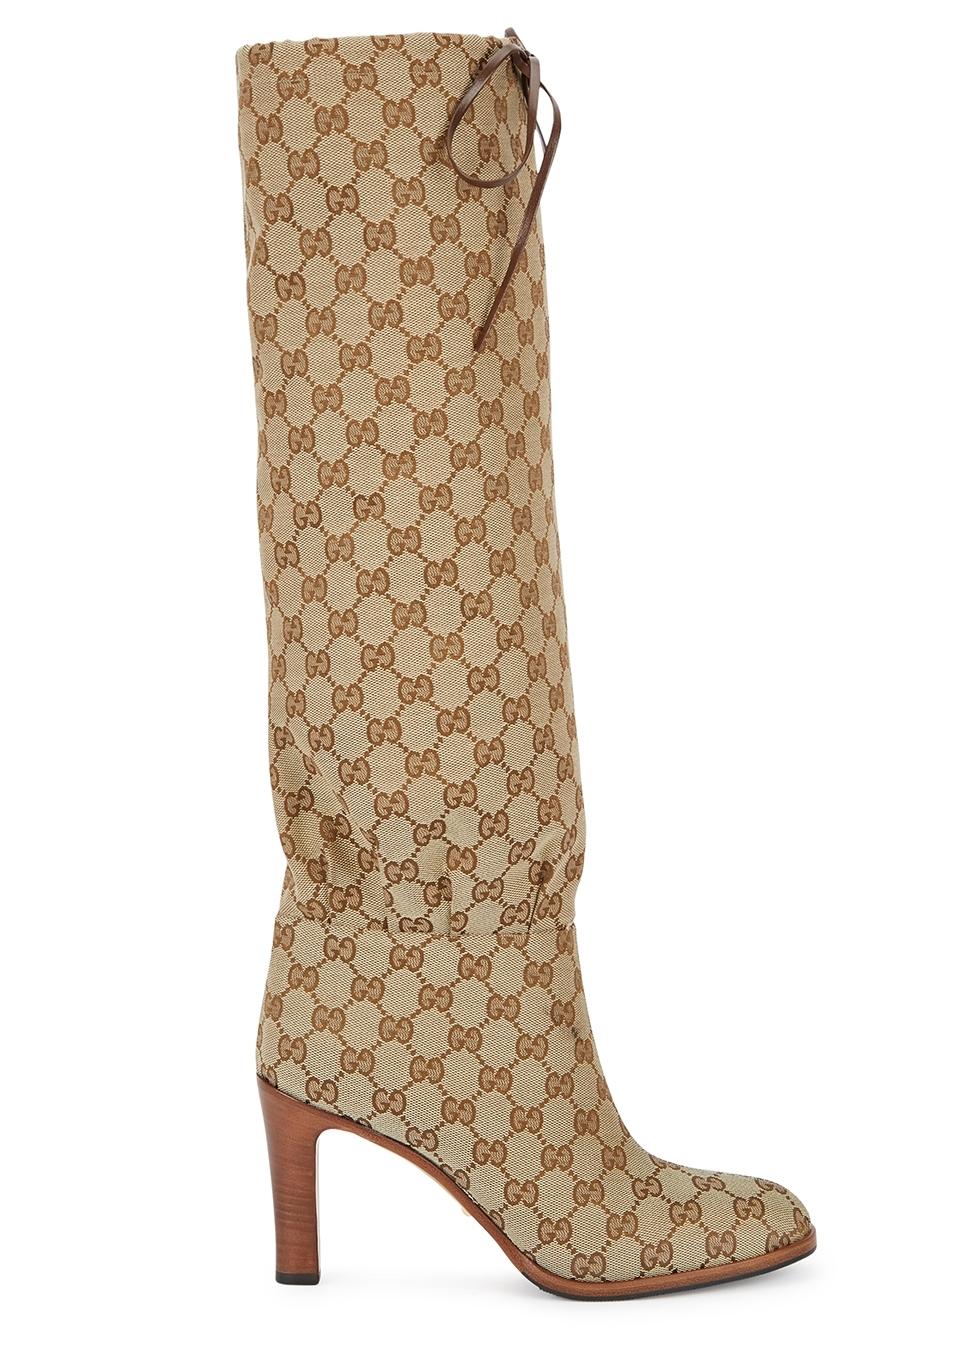 68f3ea0e01c Women s Designers Boots - Ladies Boots - Harvey Nichols